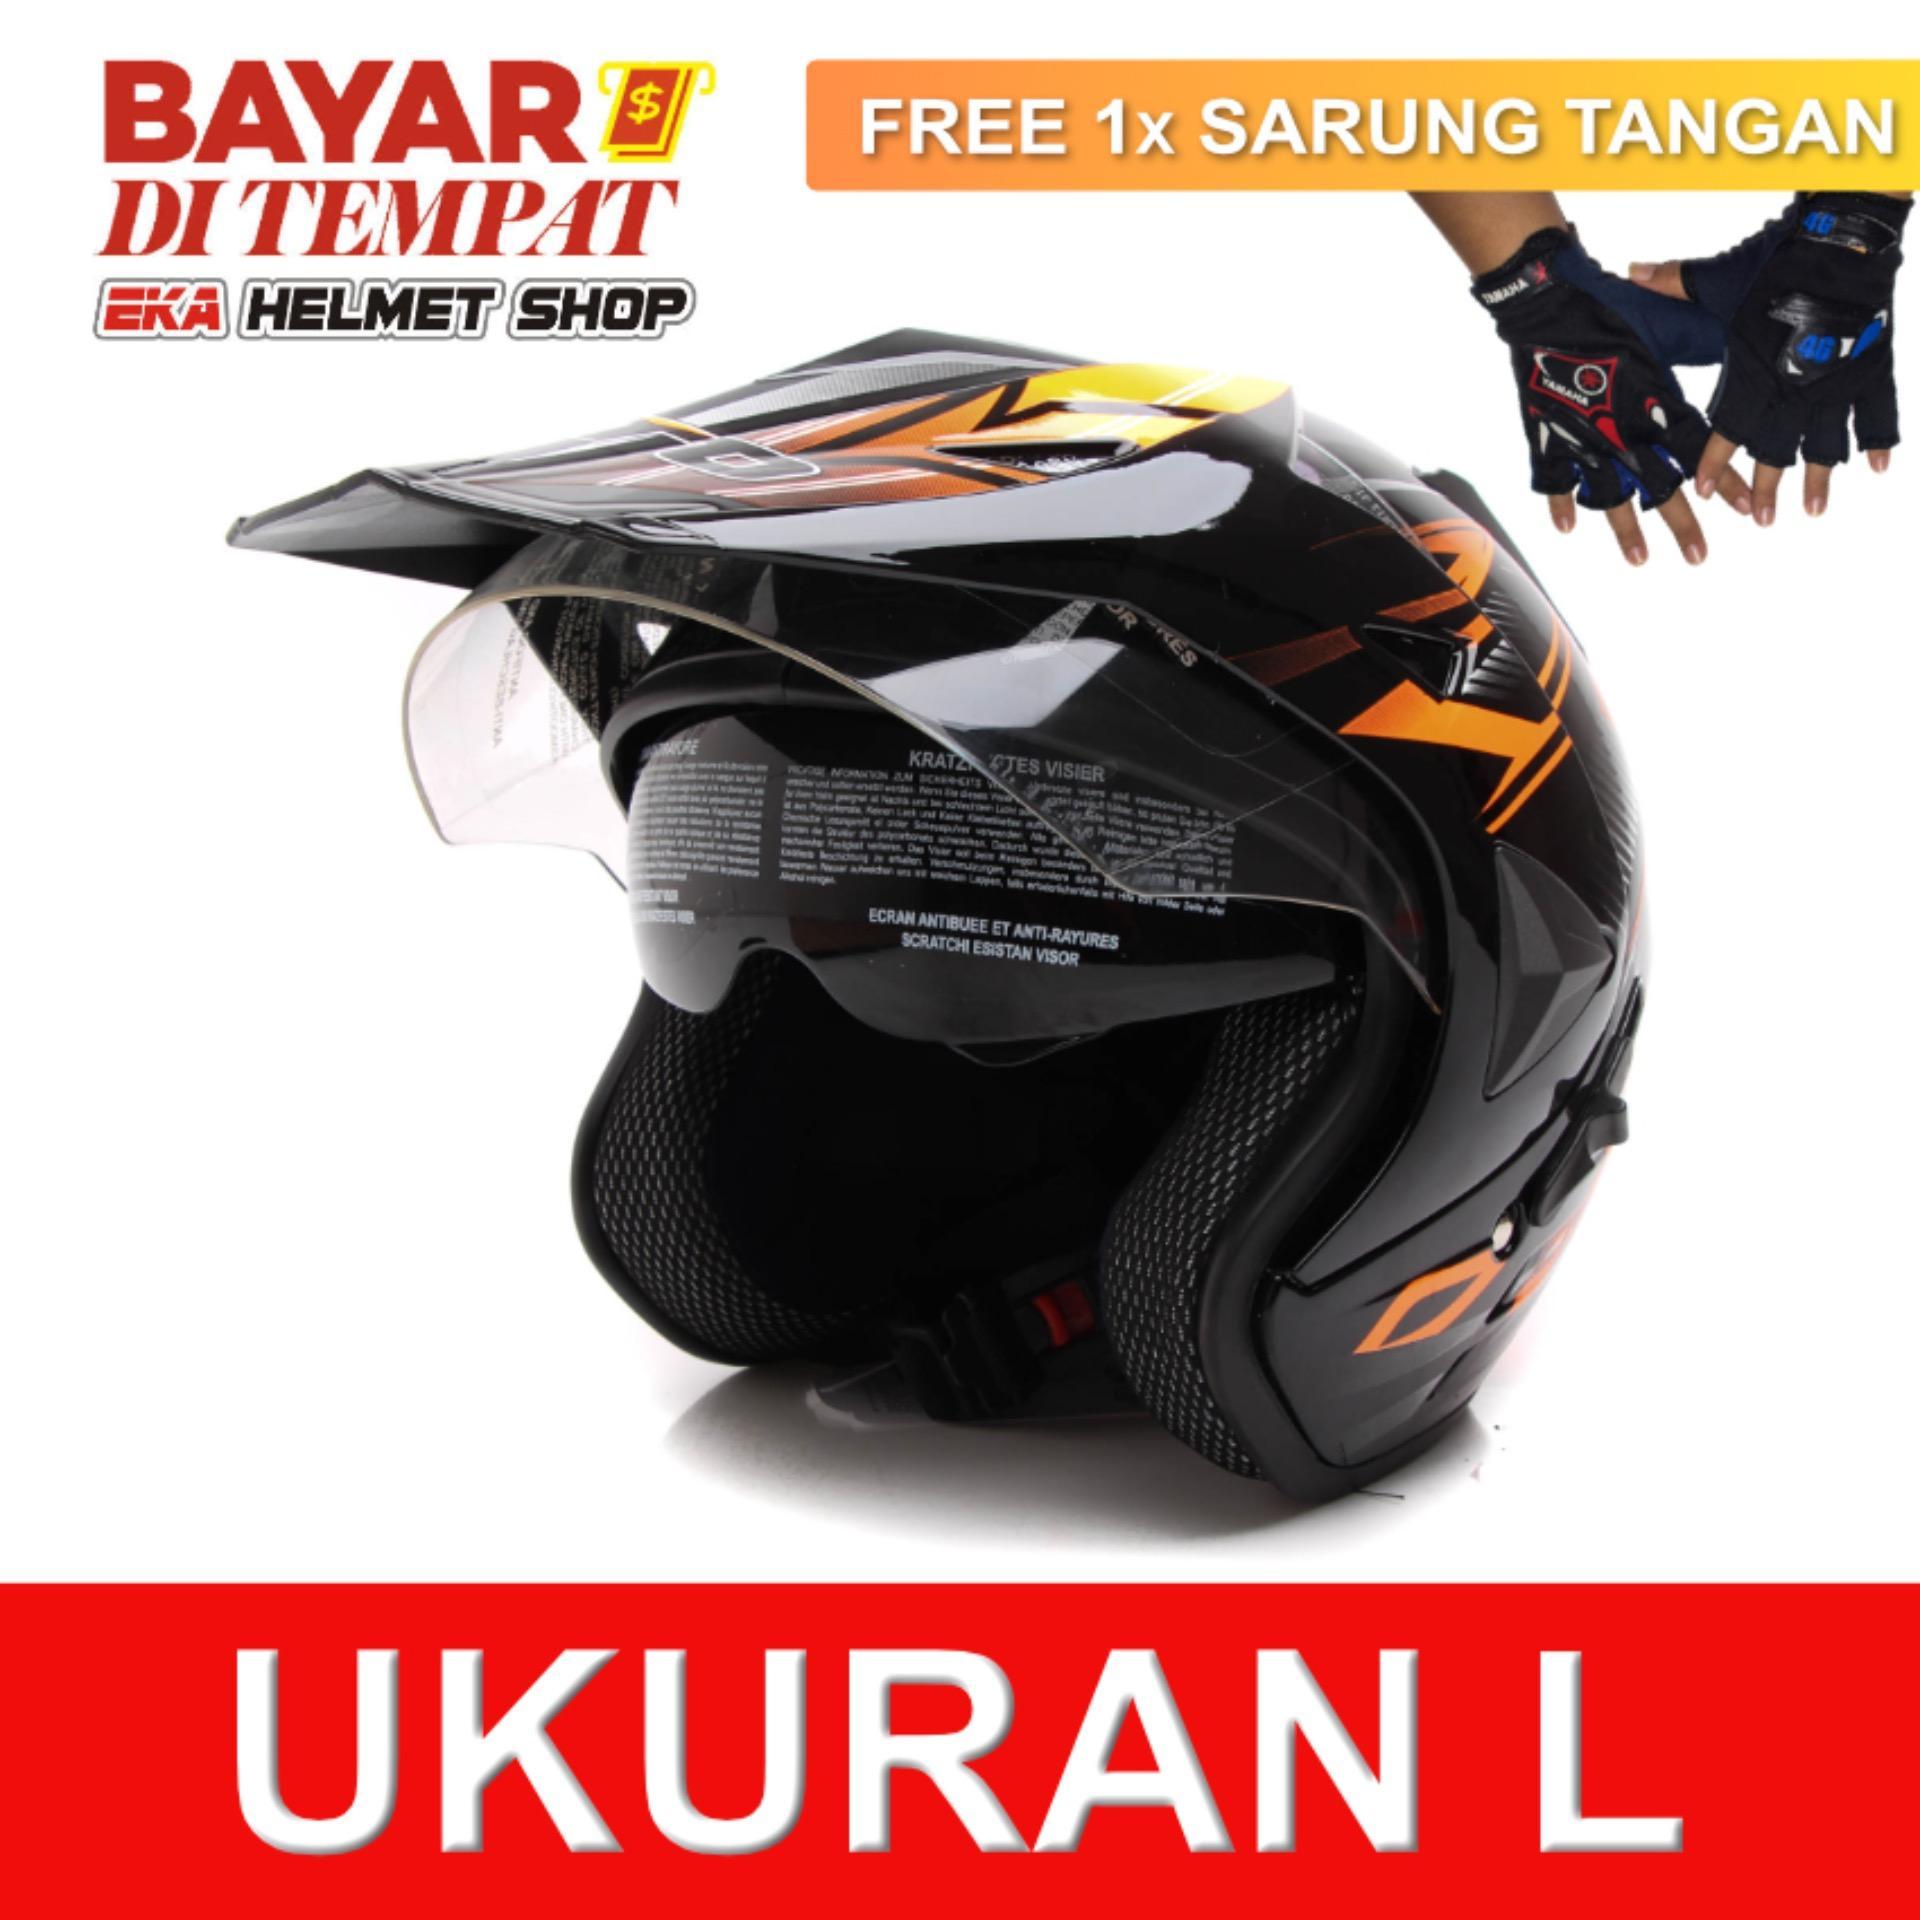 Toko Wto Helmet Pro Sight Cross Hitam Oren Promo Gratis Sarung Tangan Termurah Di Banten